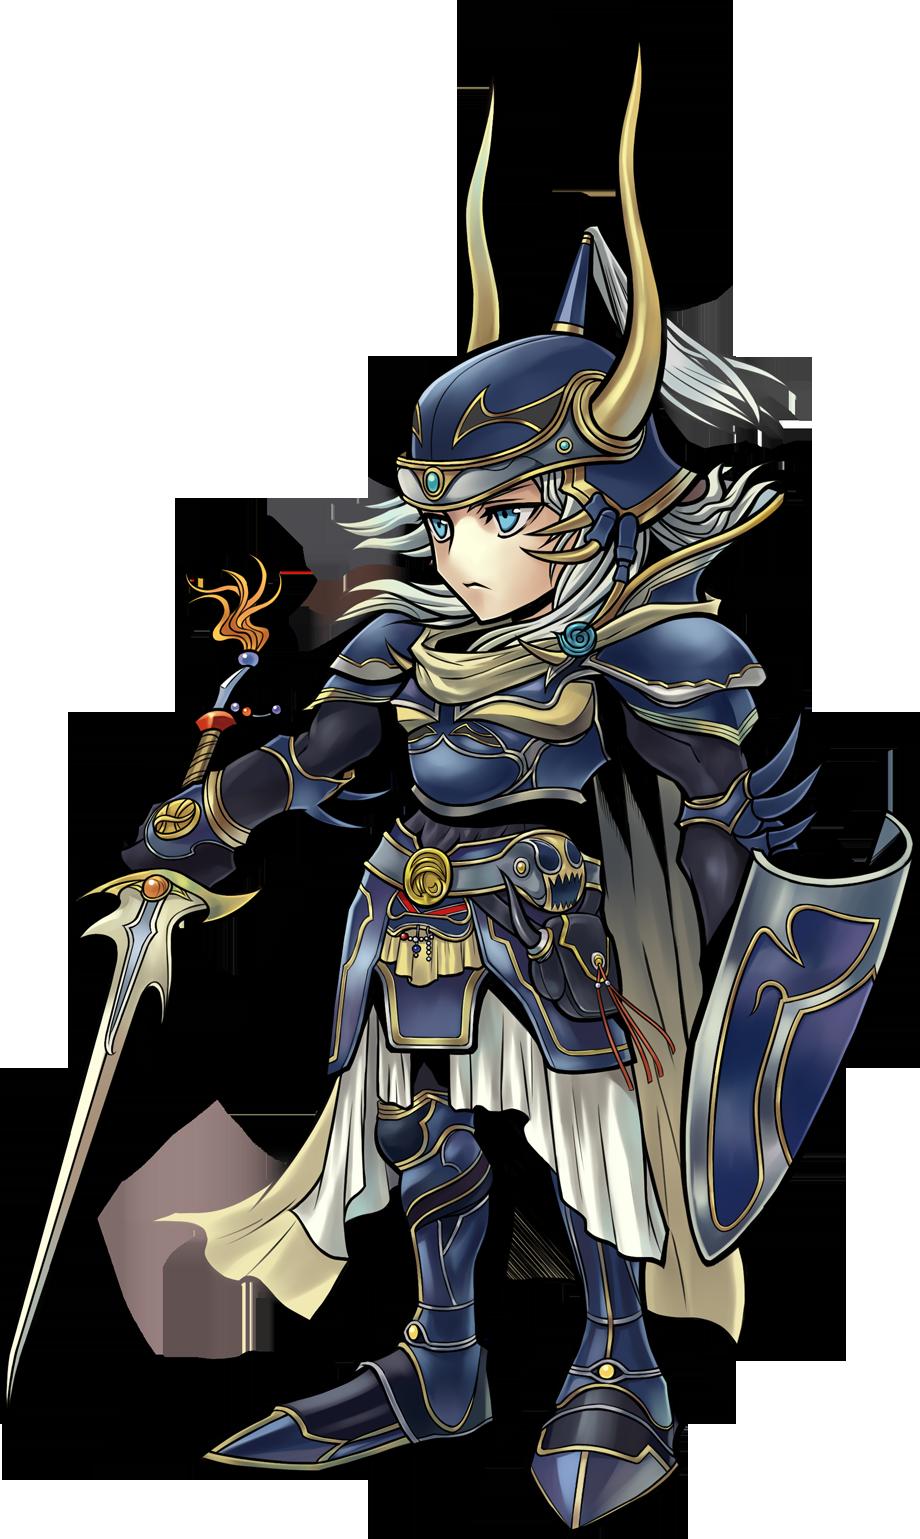 Warrior of Light (Dissidia)/Opera Omnia